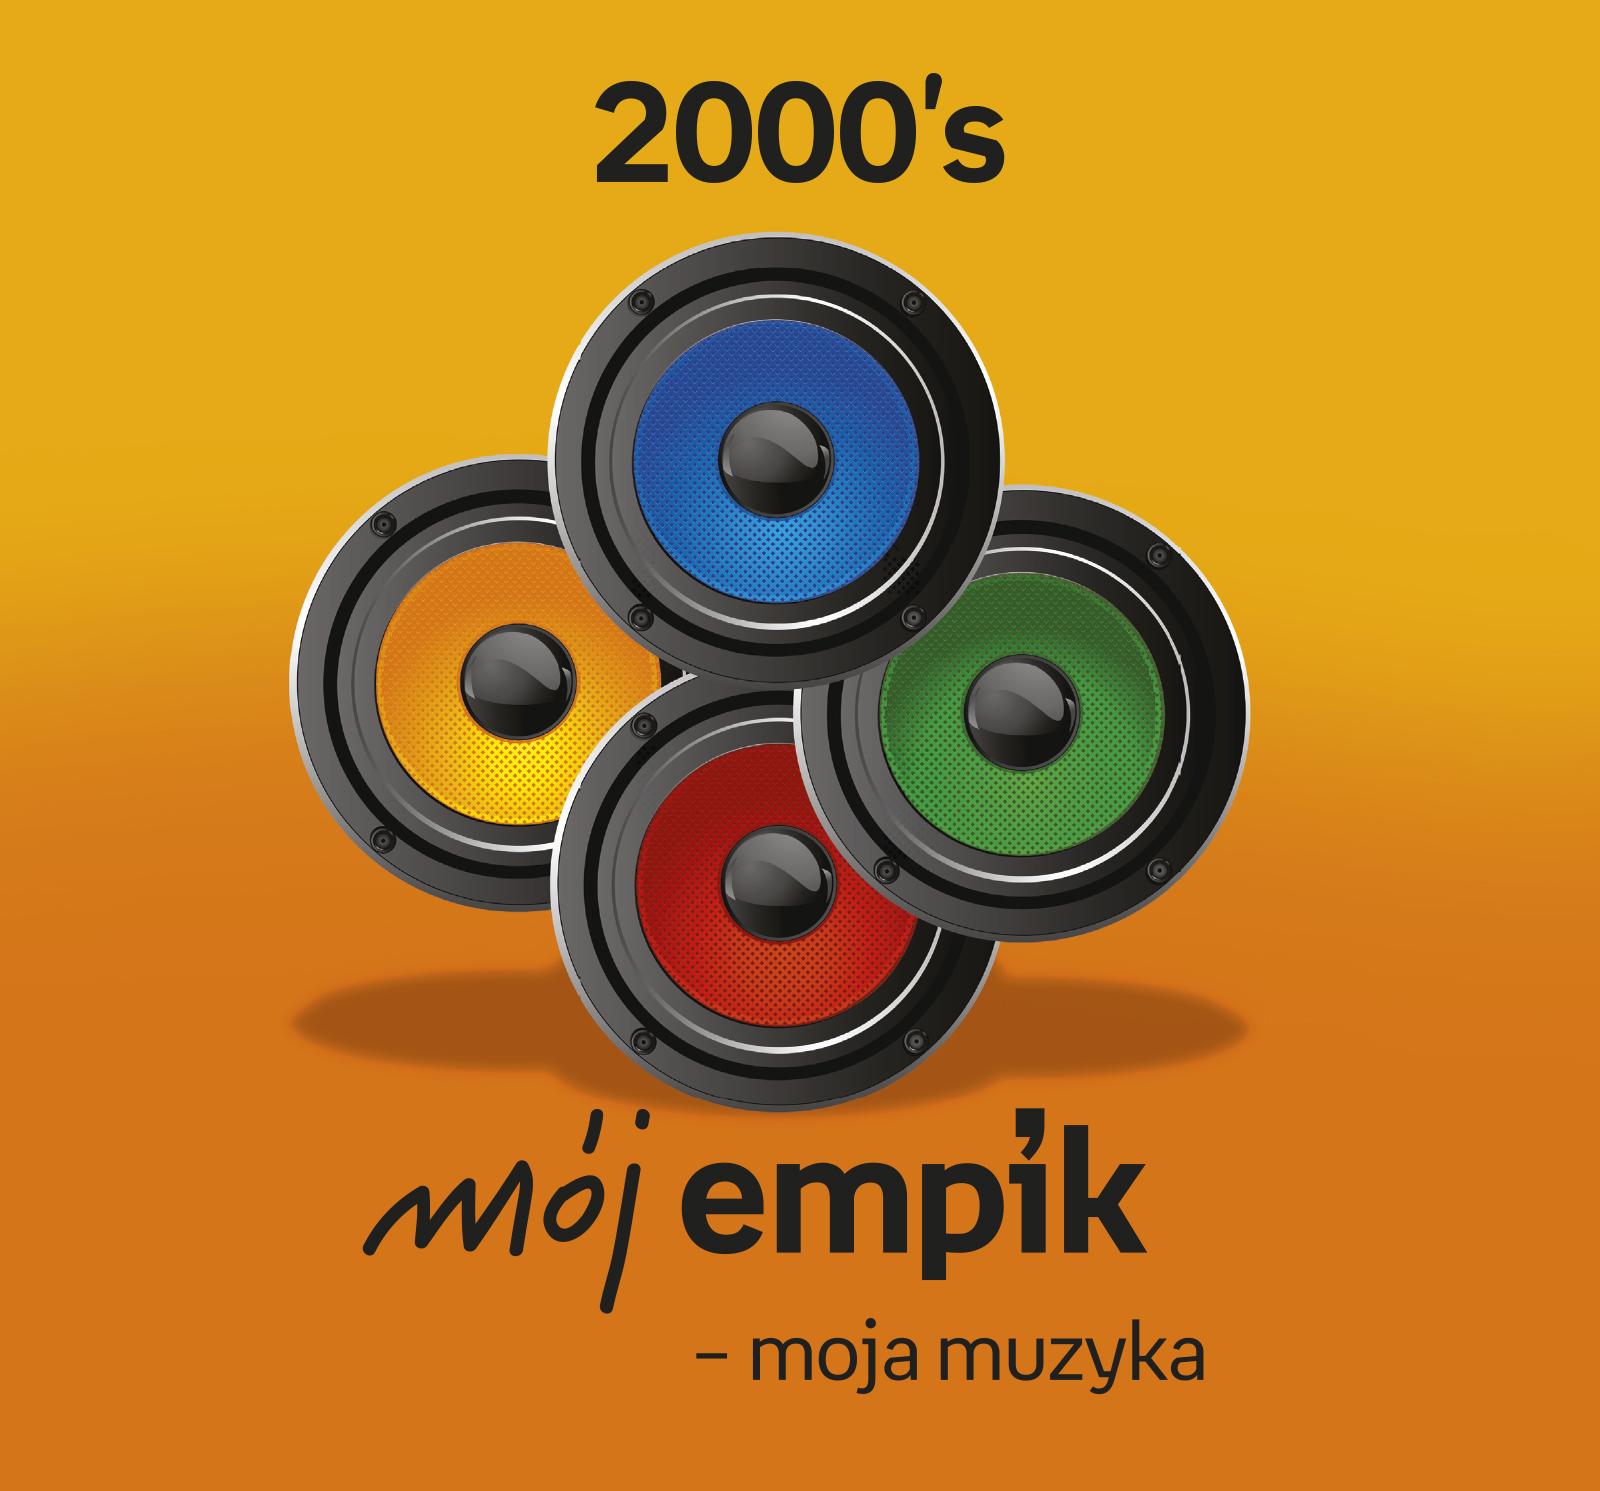 Mój Empik – moja muzyka: 2000's